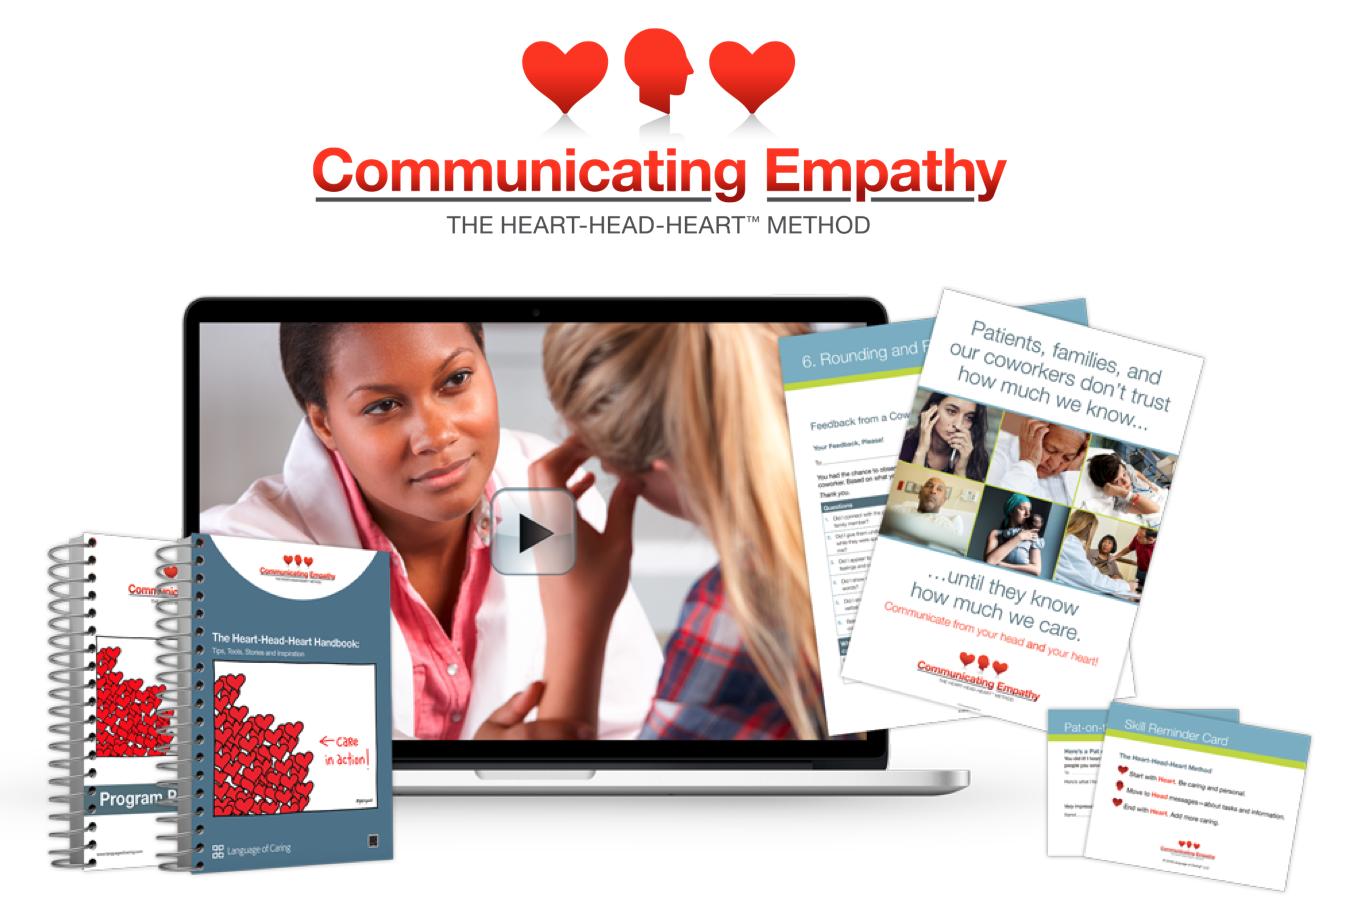 Communicating Empathy: Heart-Head-Heart